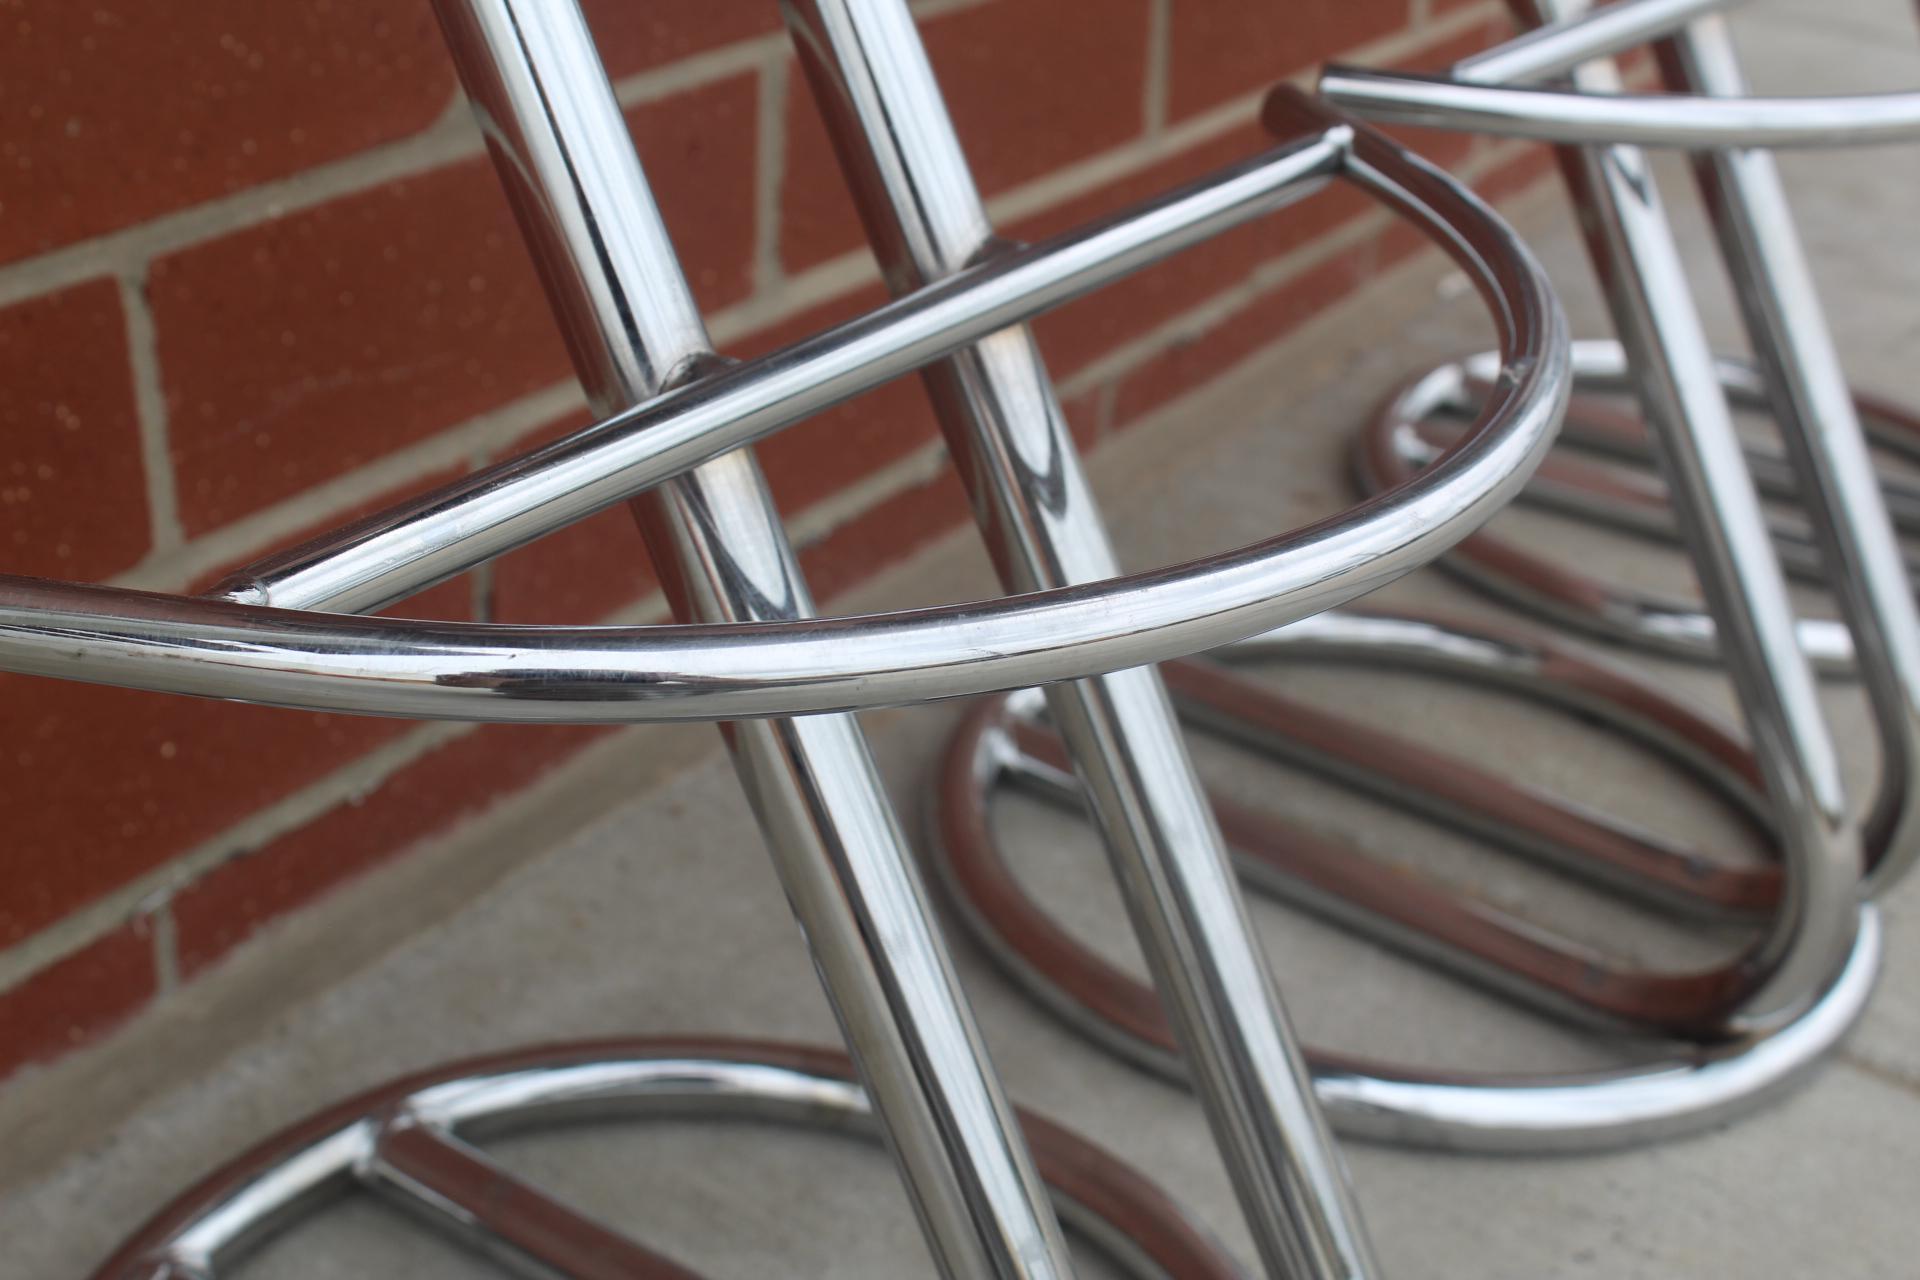 Vintage Art Deco Chrome u0026 Leather Bar Stools - Set of 3 - Image 4 of  sc 1 st  Chairish & Vintage Art Deco Chrome u0026 Leather Bar Stools - Set of 3 | Chairish islam-shia.org